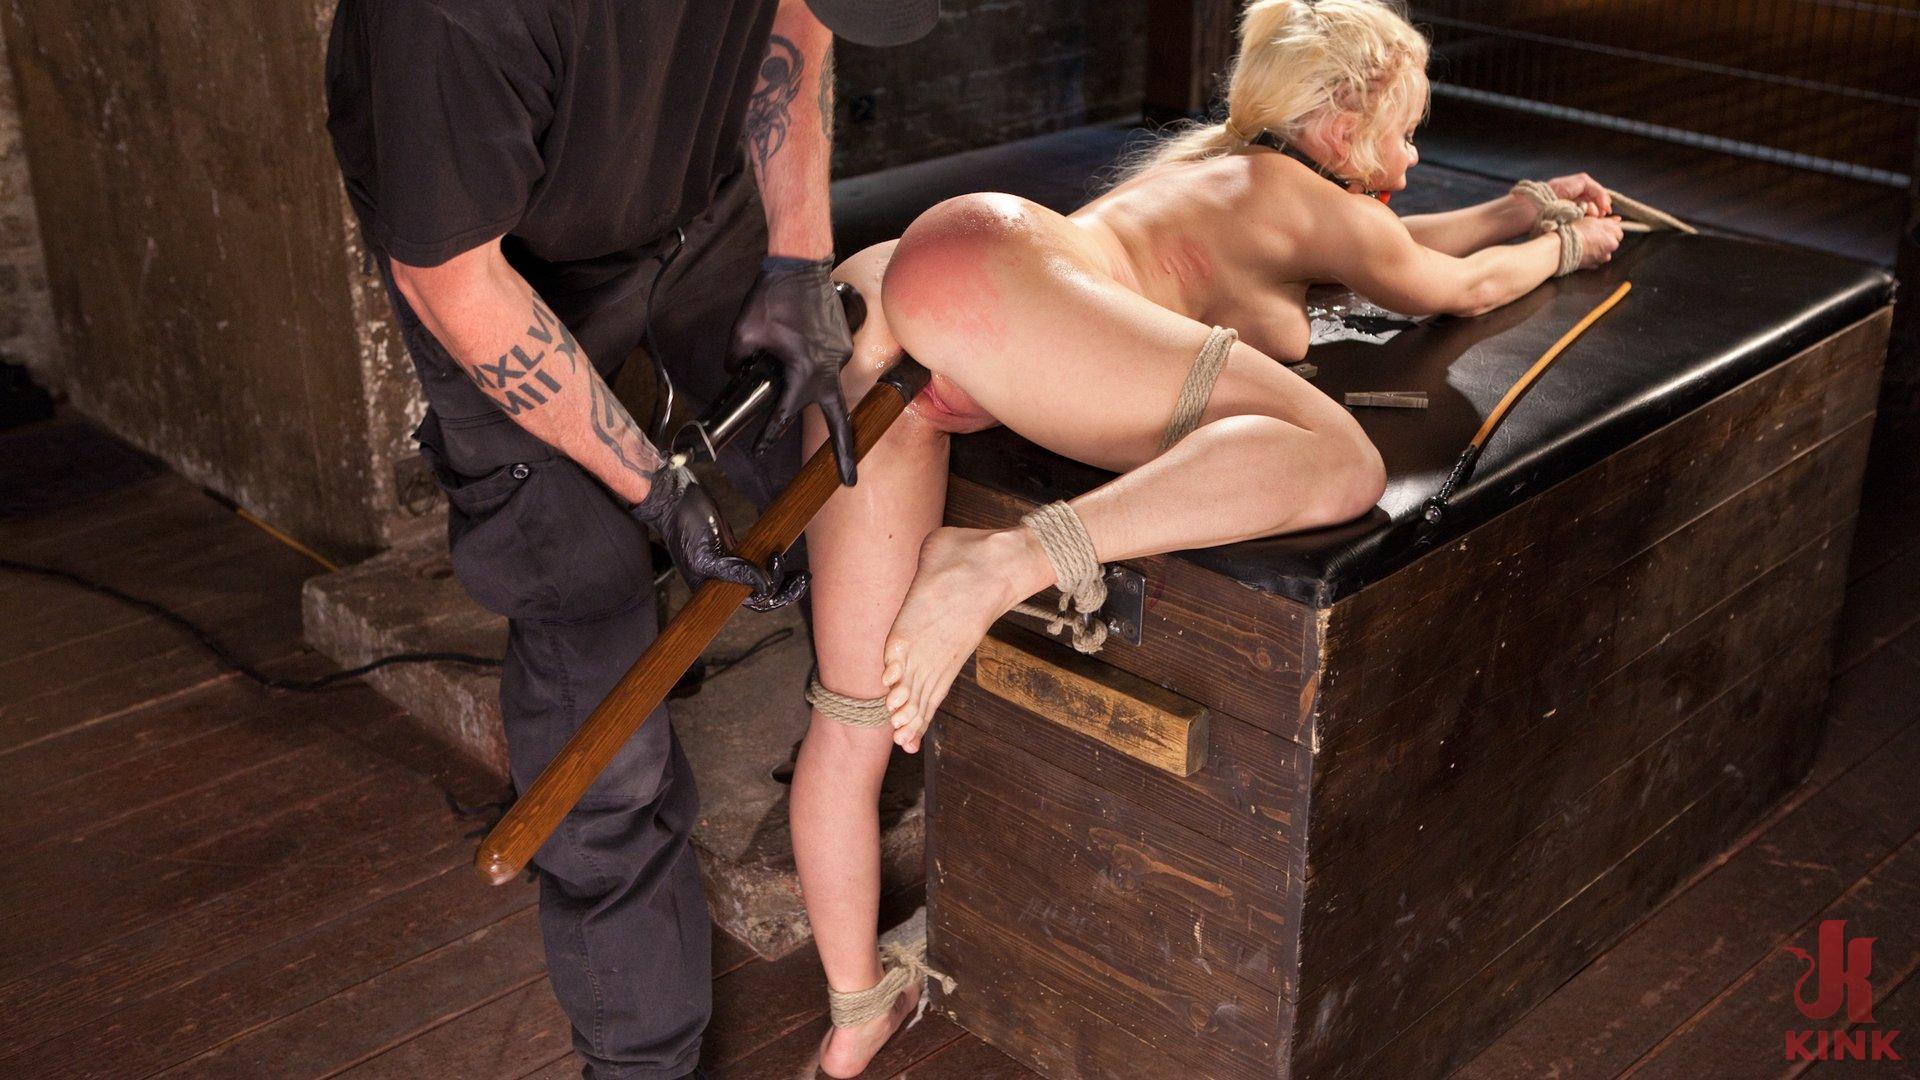 Photo number 7 from Blonde Bombshell Explodes in Extreme Bondage!! shot for Hogtied on Kink.com. Featuring Nikki Delano in hardcore BDSM & Fetish porn.